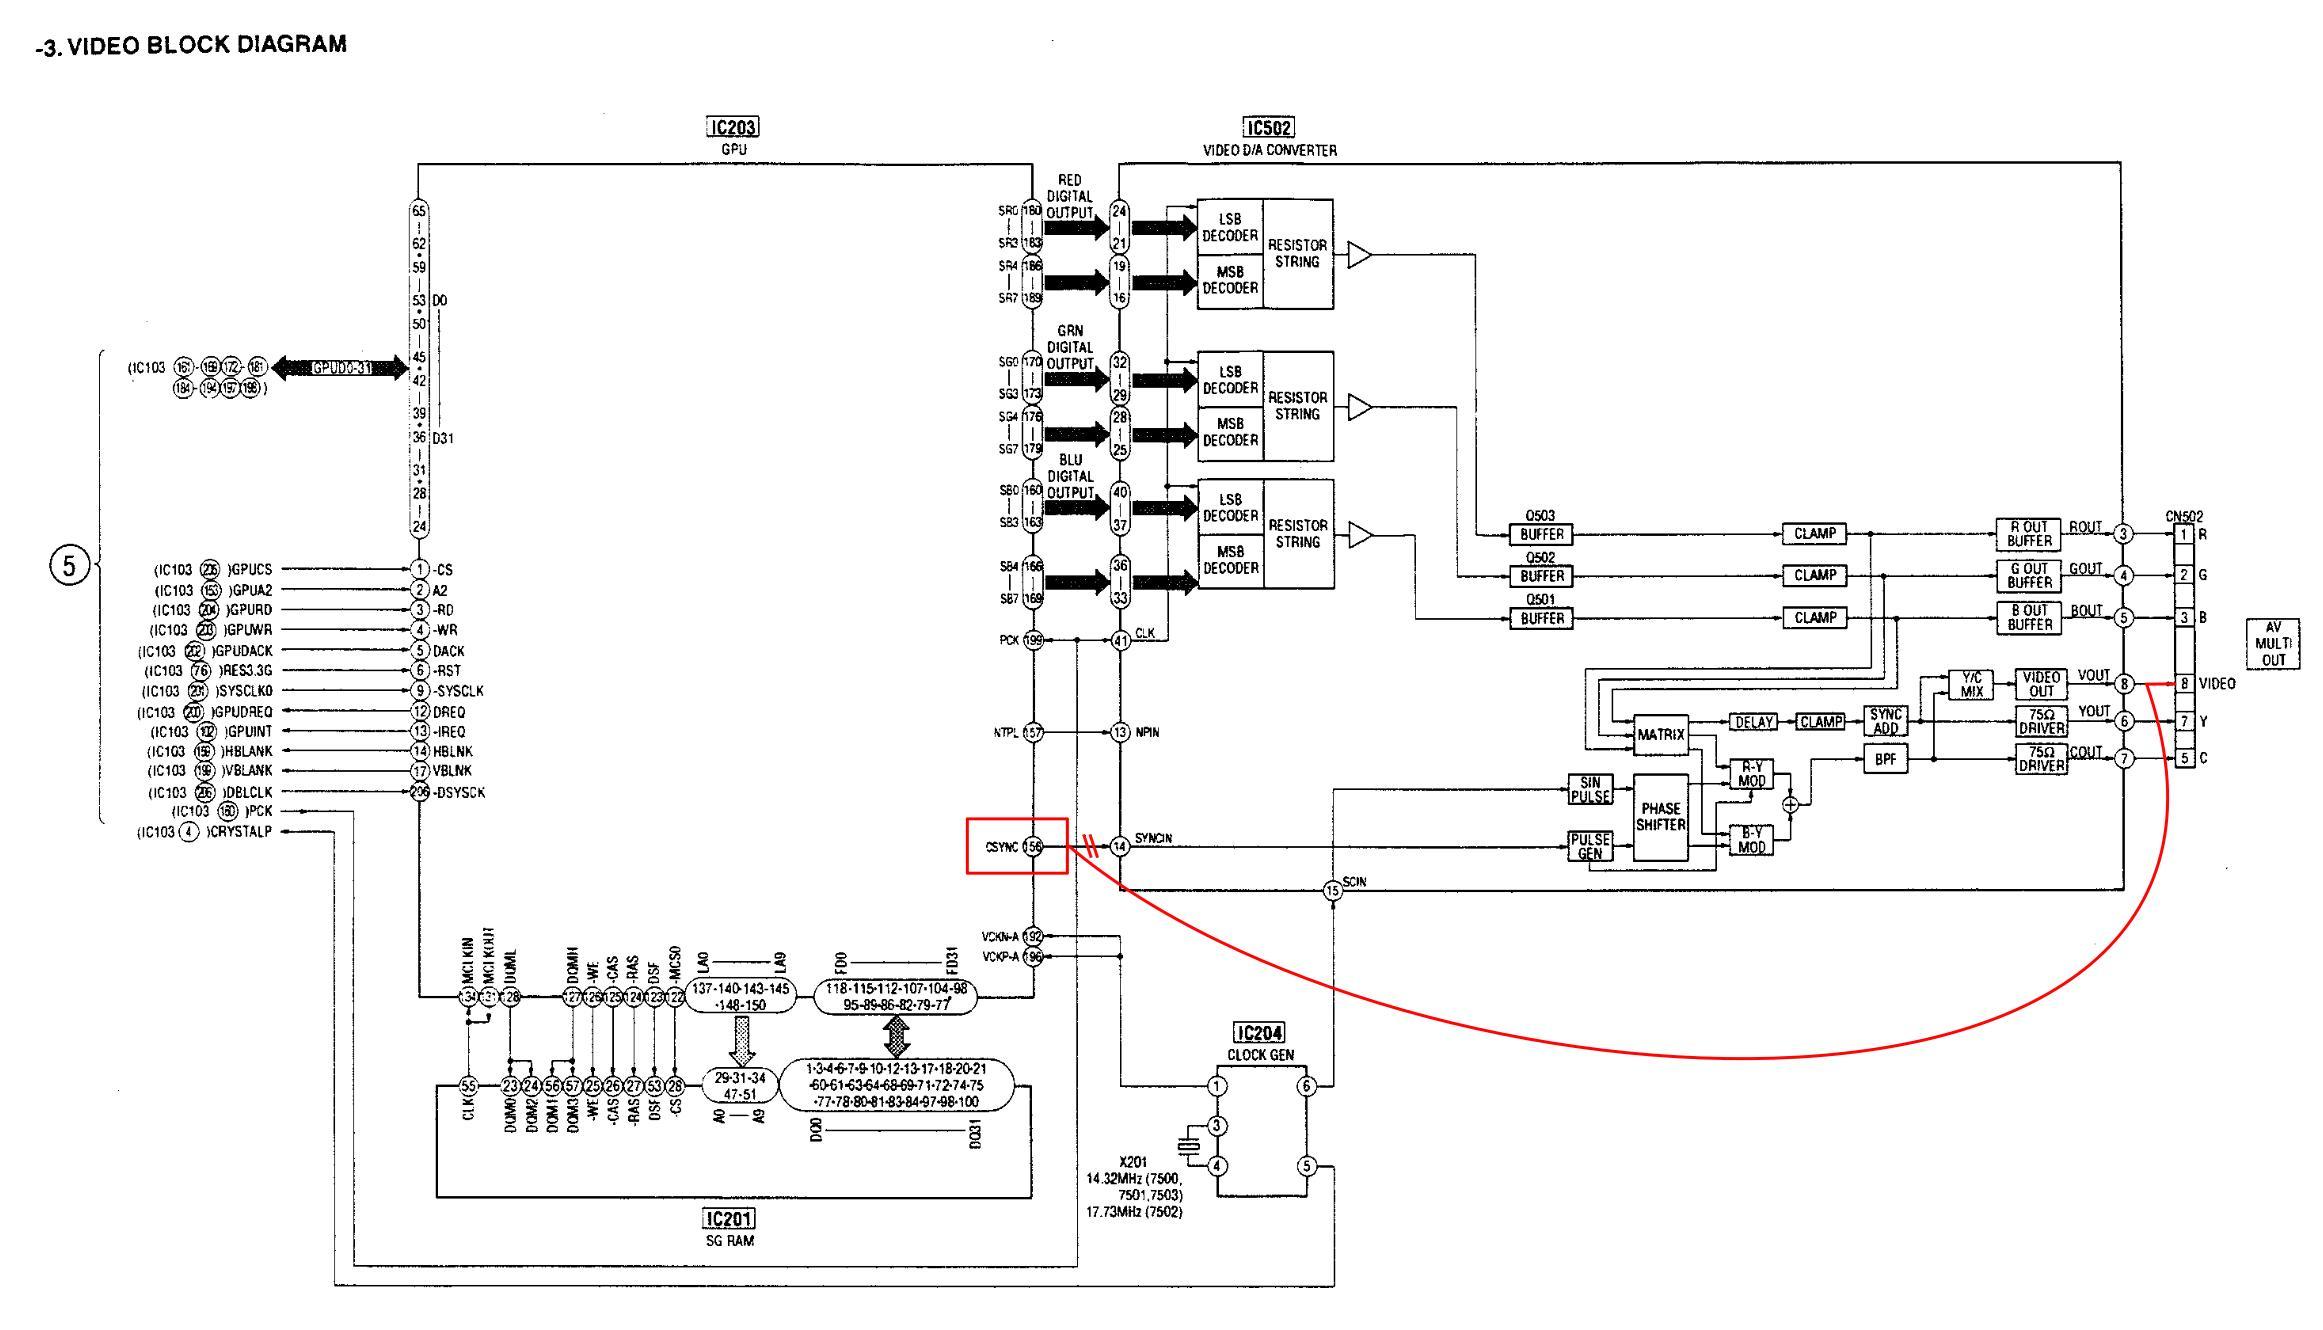 diagramme de la PU-22